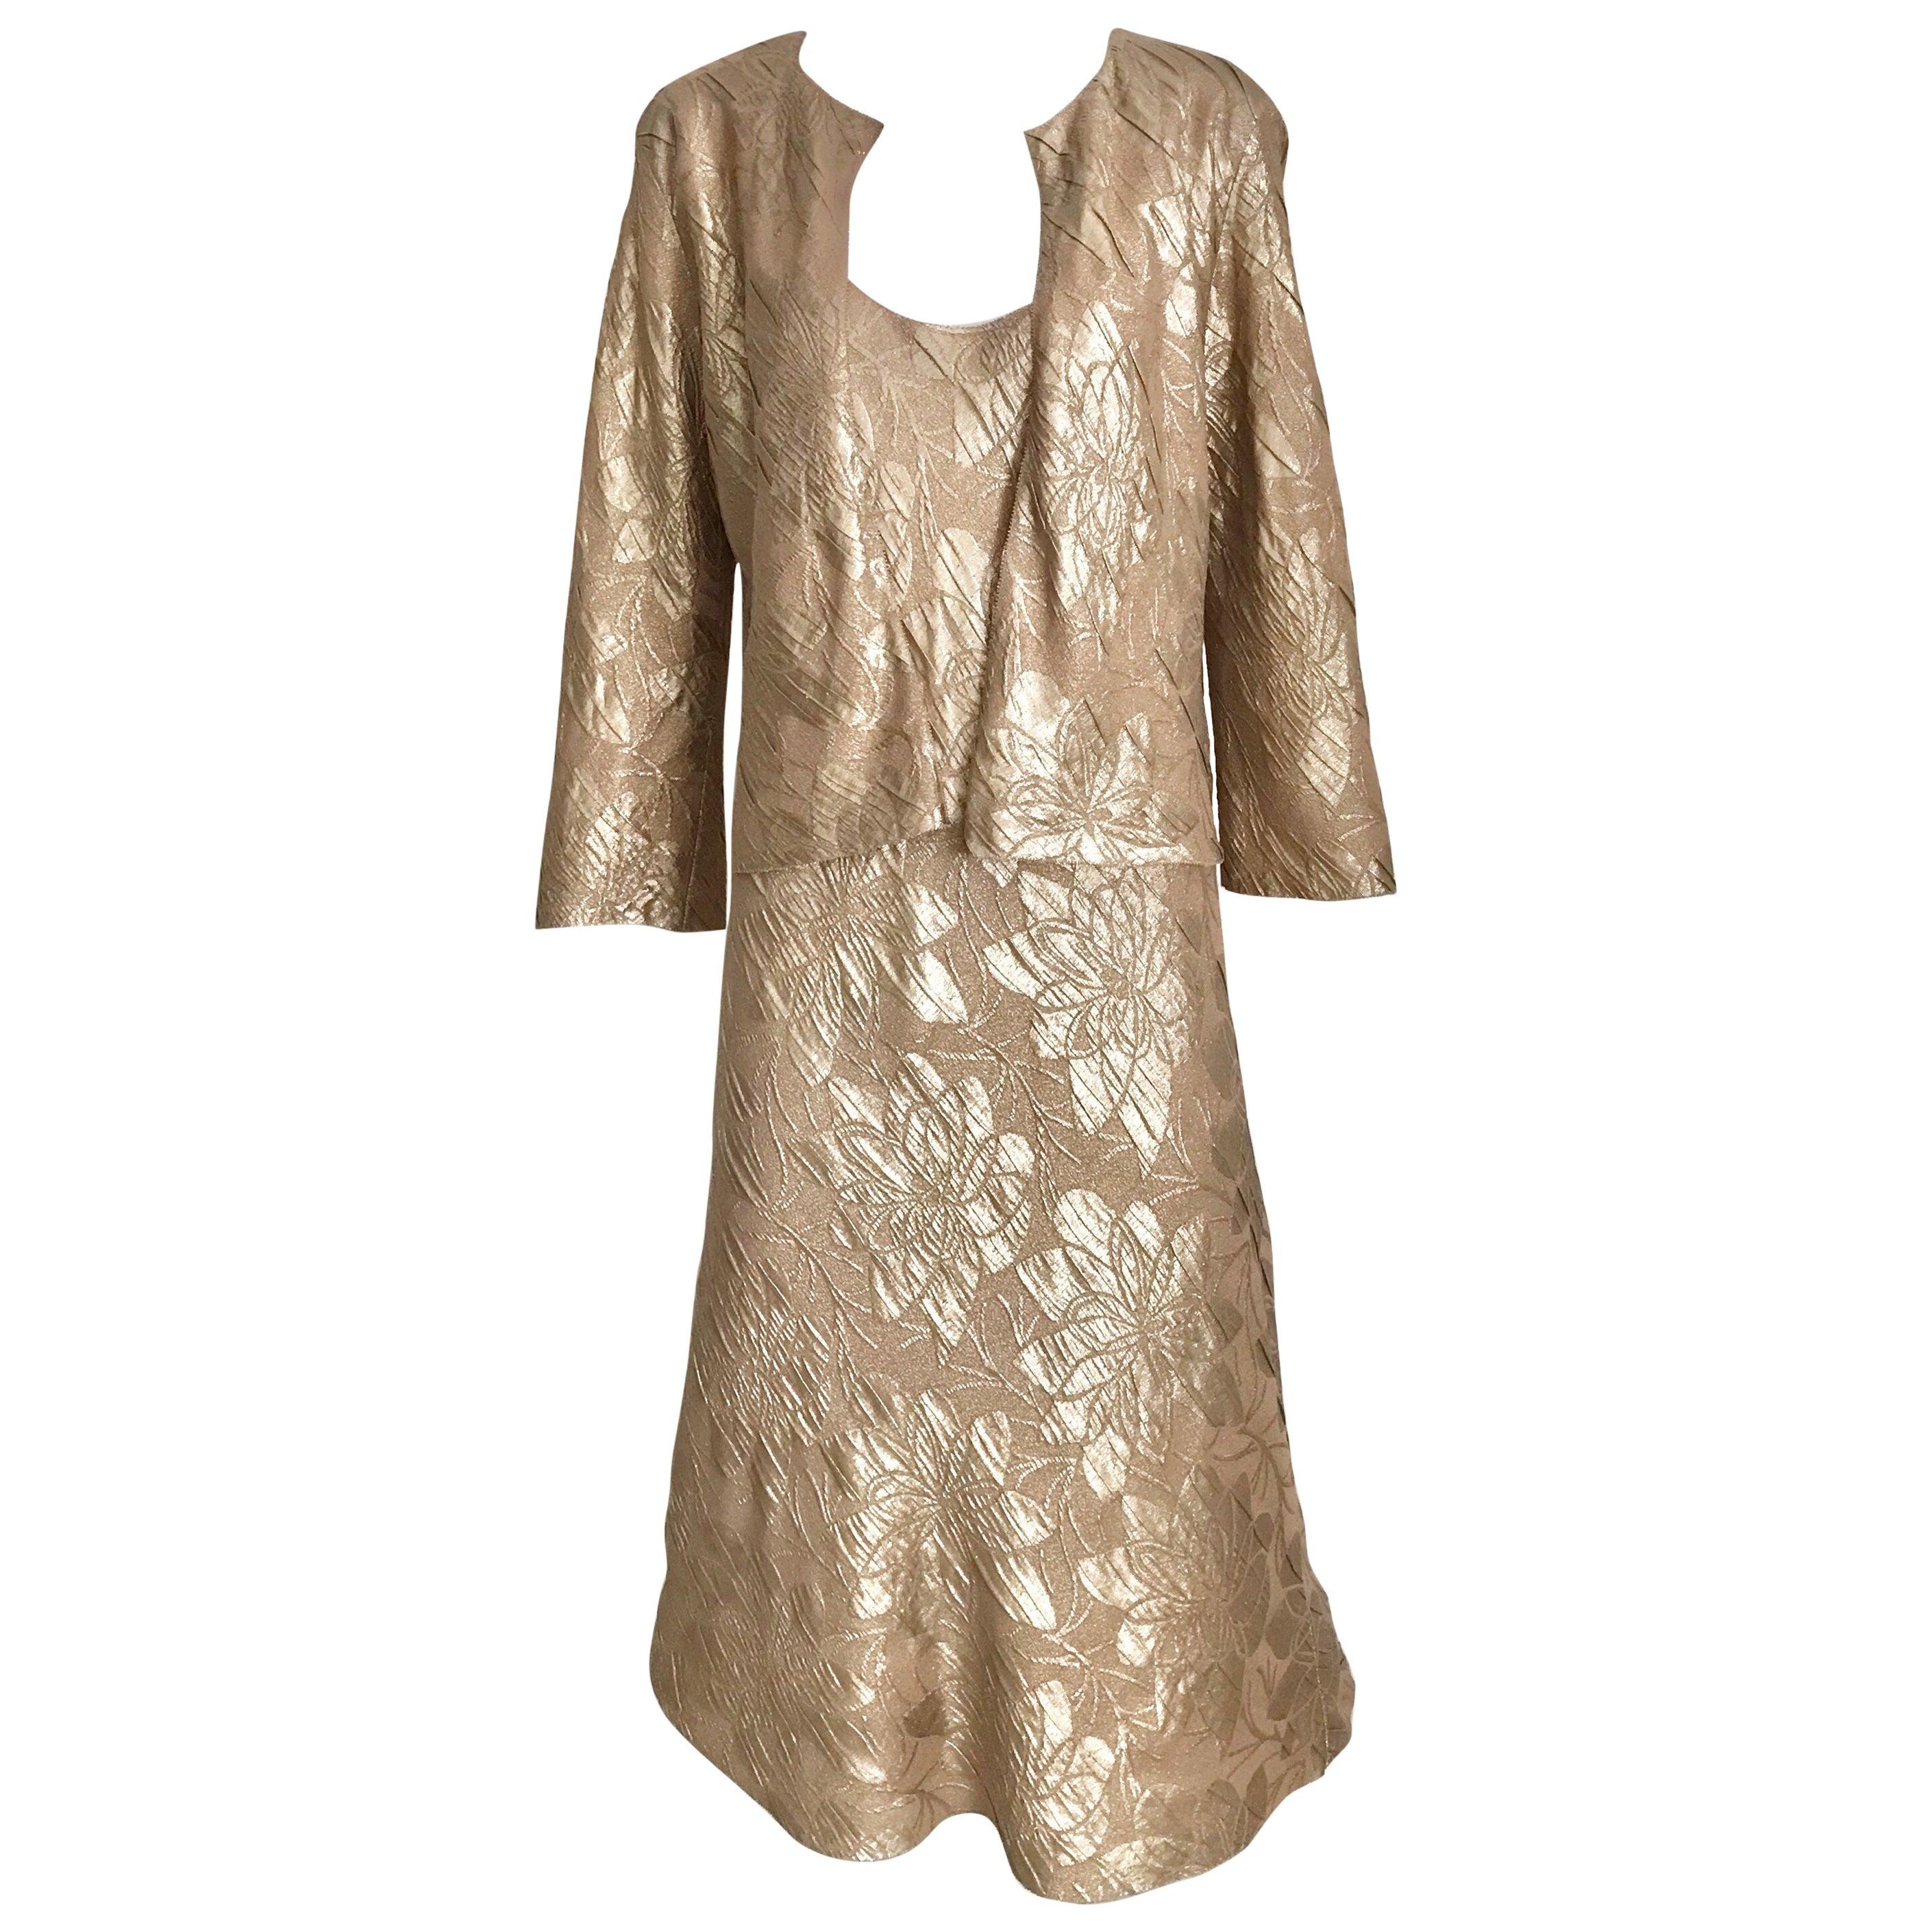 Jean Paul Gaultier Metallic Silk Jacquard  Dress with Jacket